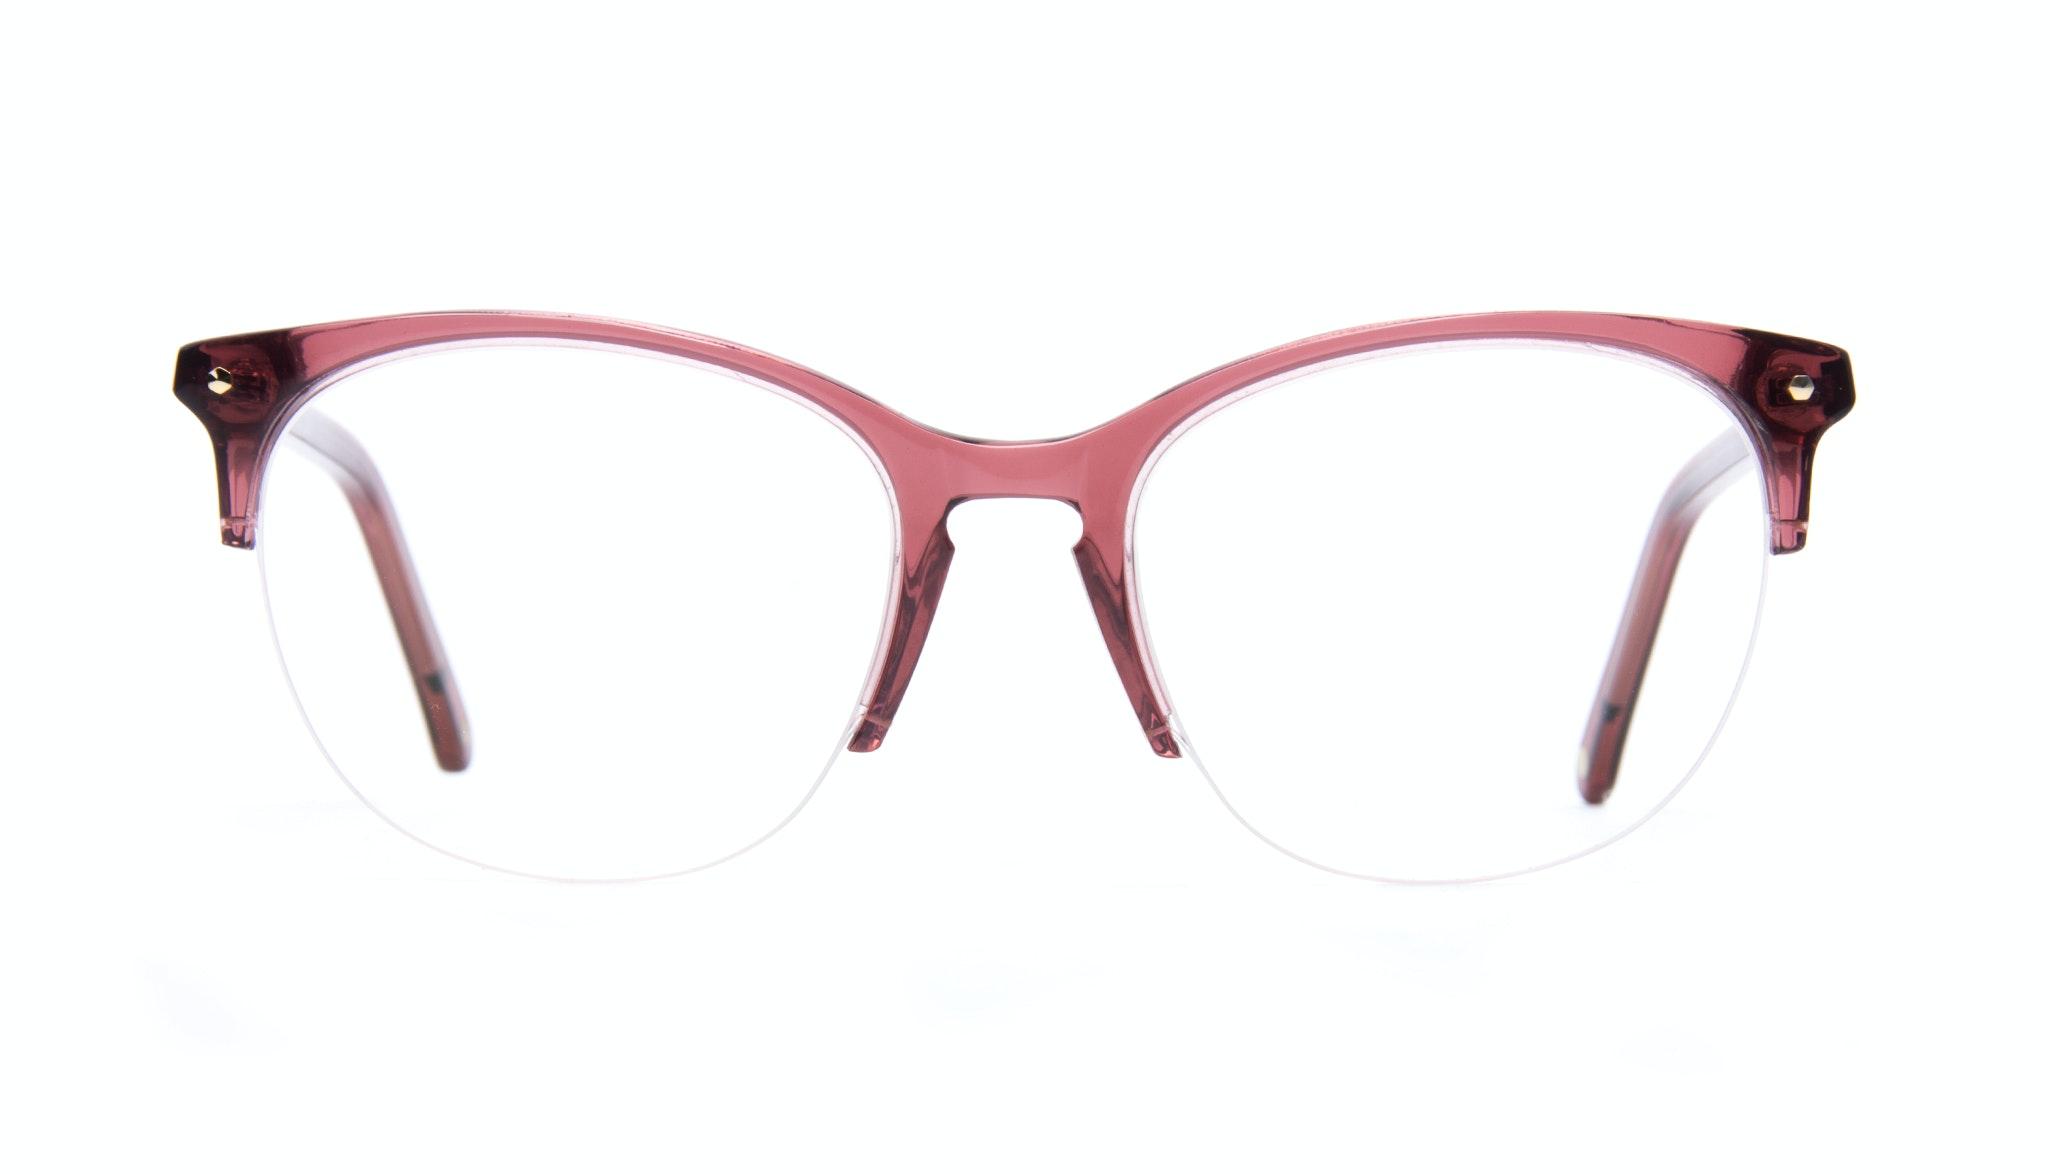 Affordable Fashion Glasses Rectangle Square Round Semi-Rimless Eyeglasses Women Nadine Light Winegum